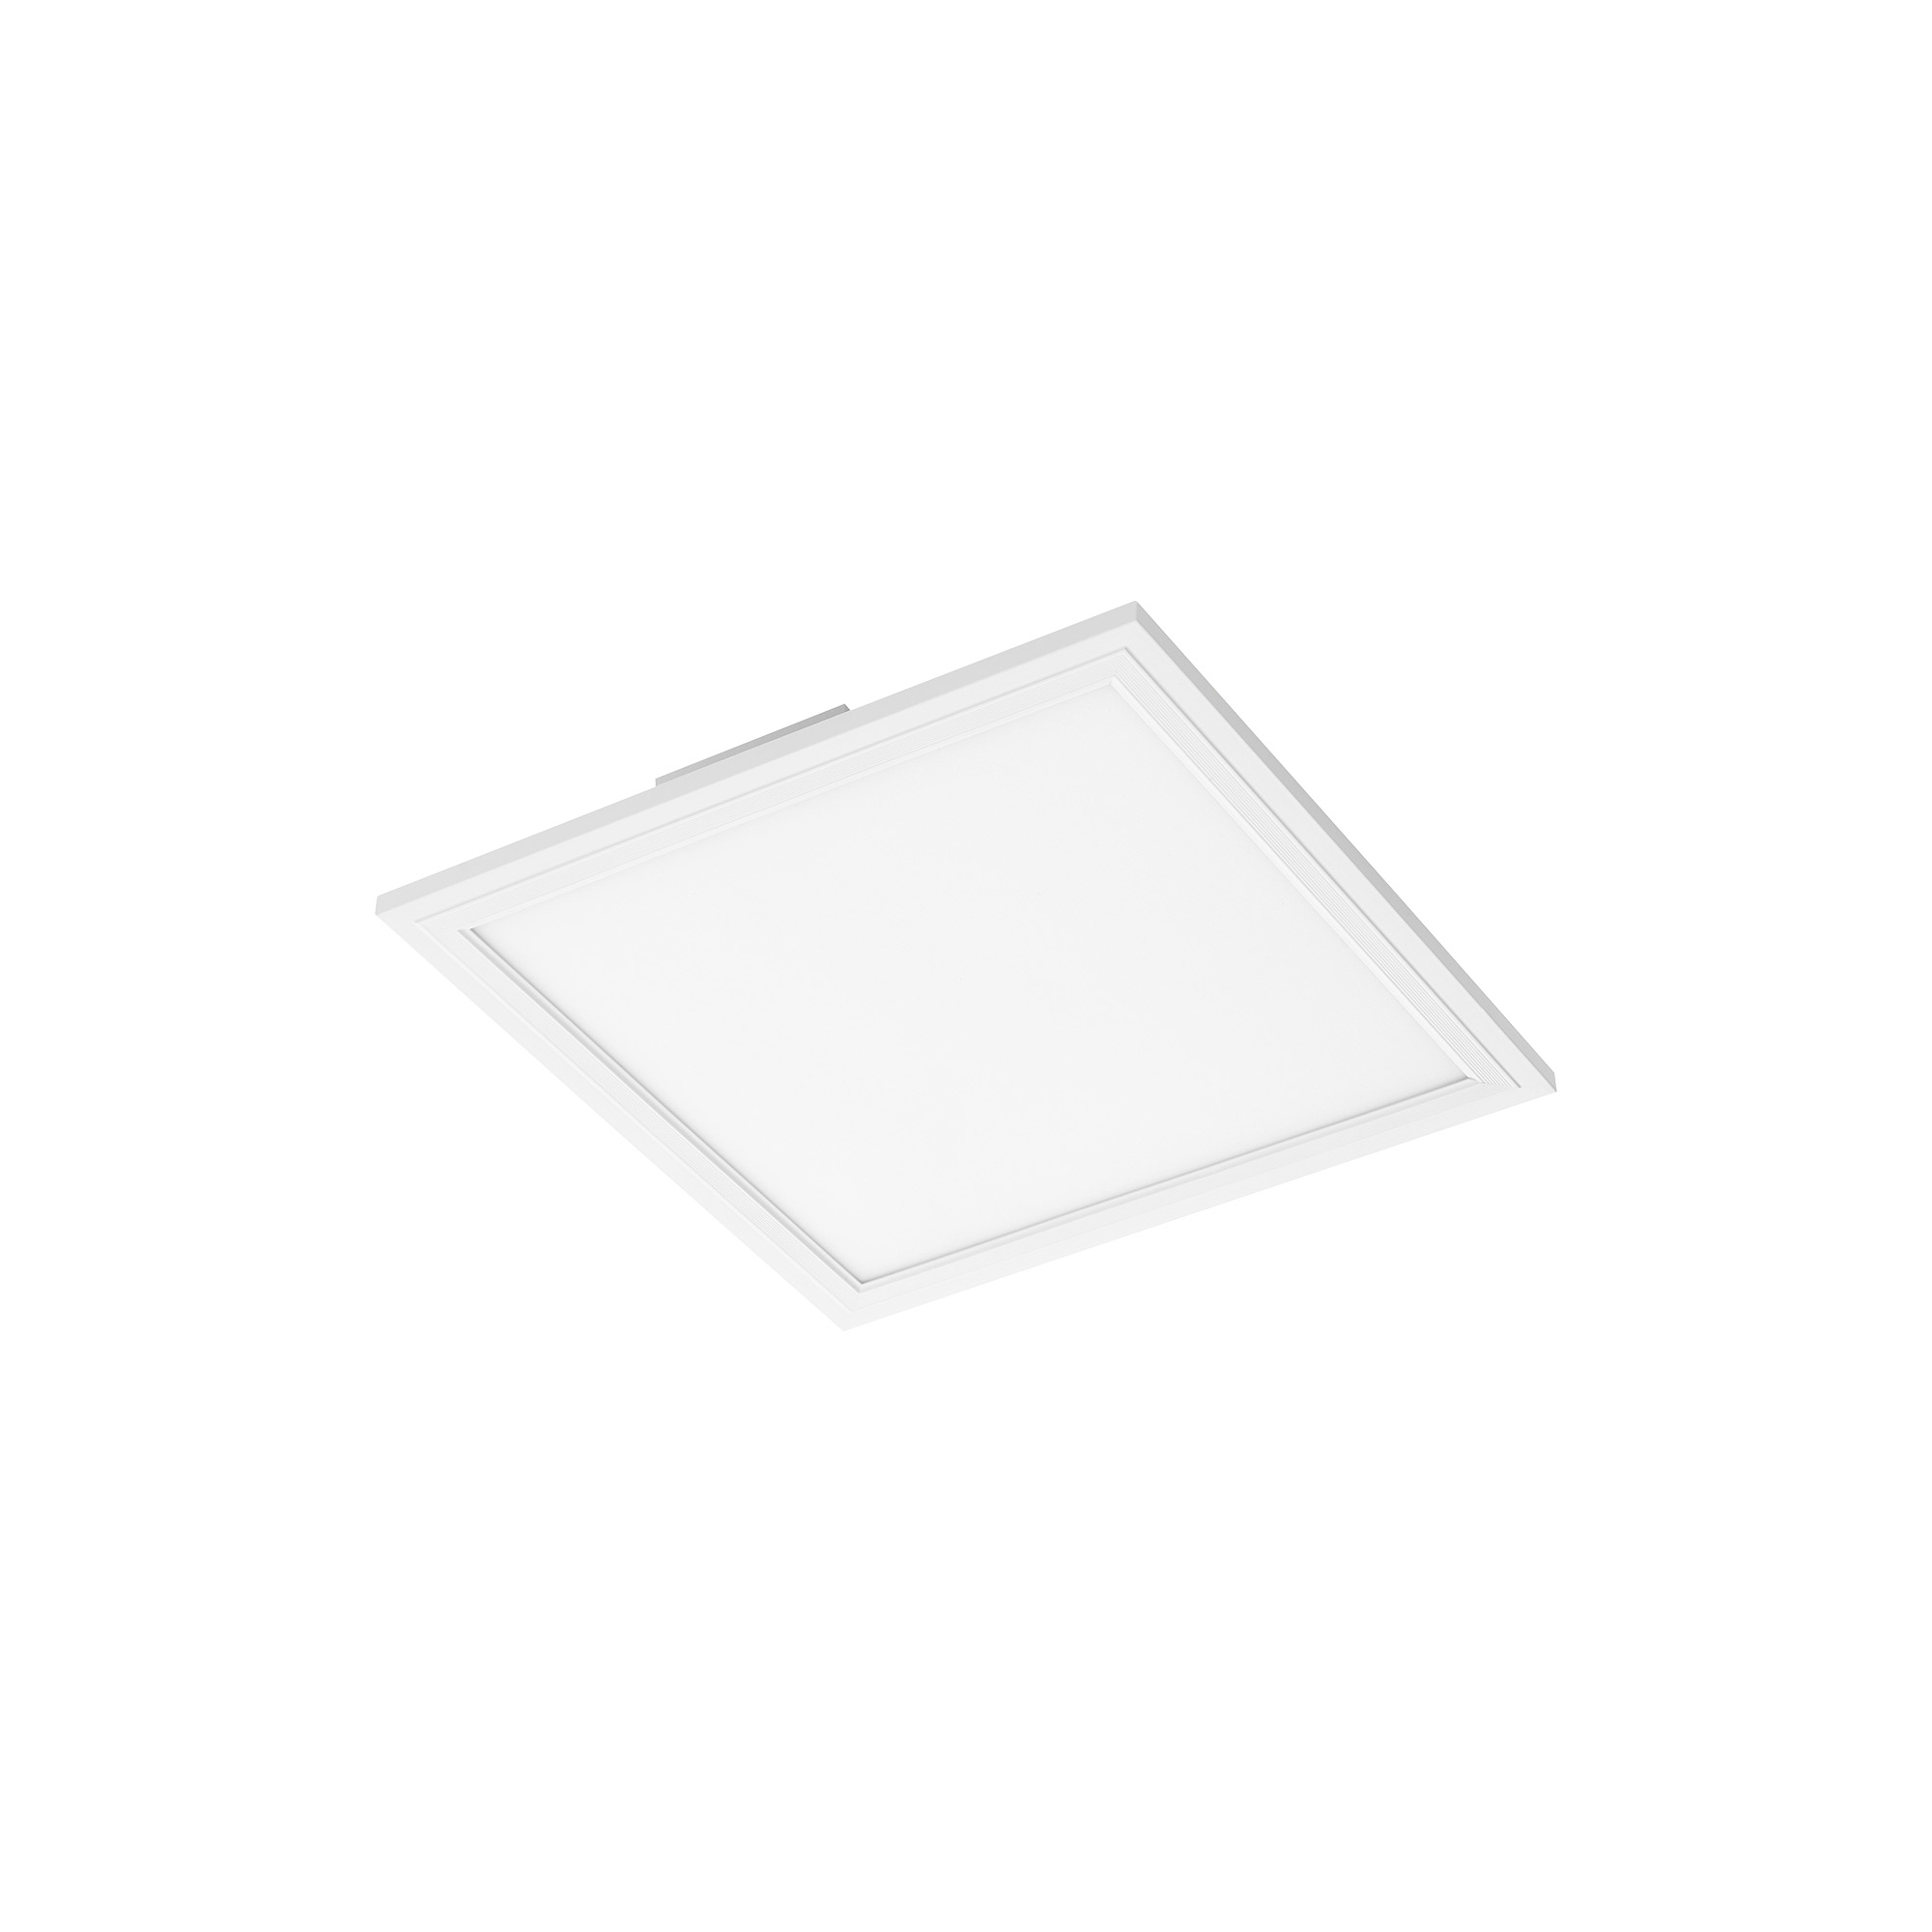 TELEFUNKEN Sensor LED Panel, 29,5 cm, 13 W, Weiß